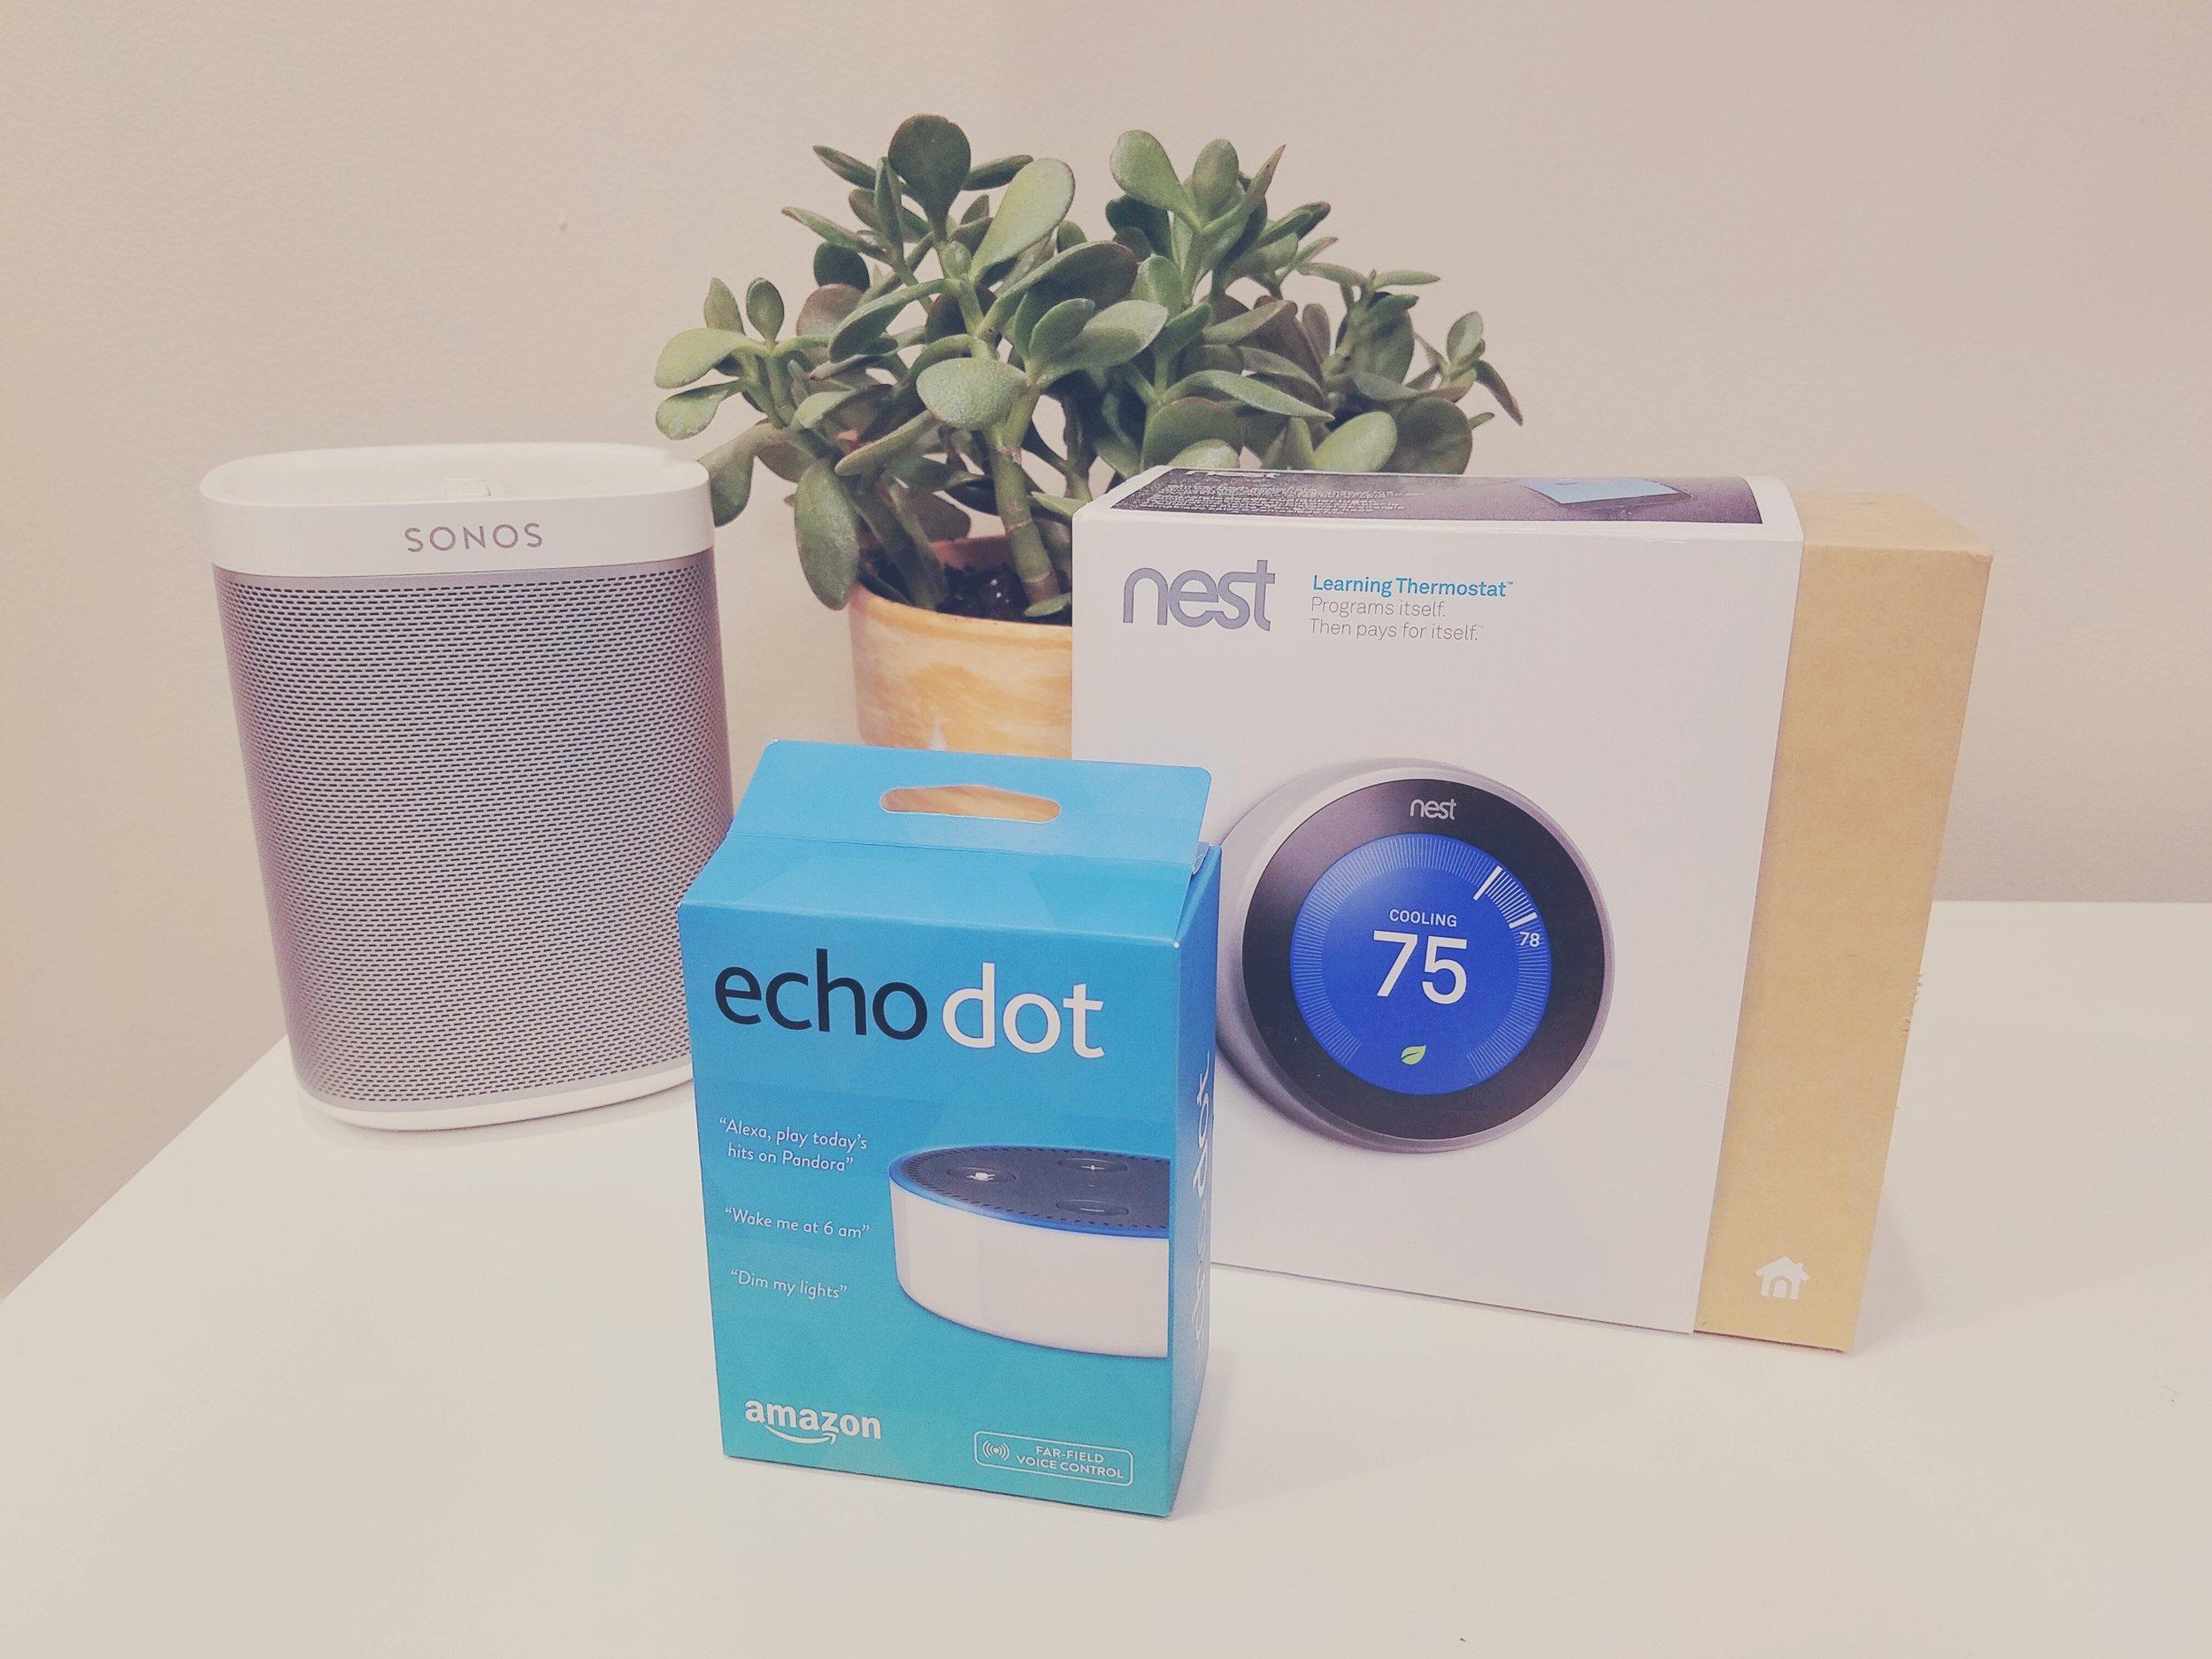 Amazon Alexa Compatible Devices, Sonos Speaker, Amazon Echo Dot & Nest Thermostat Generation 3